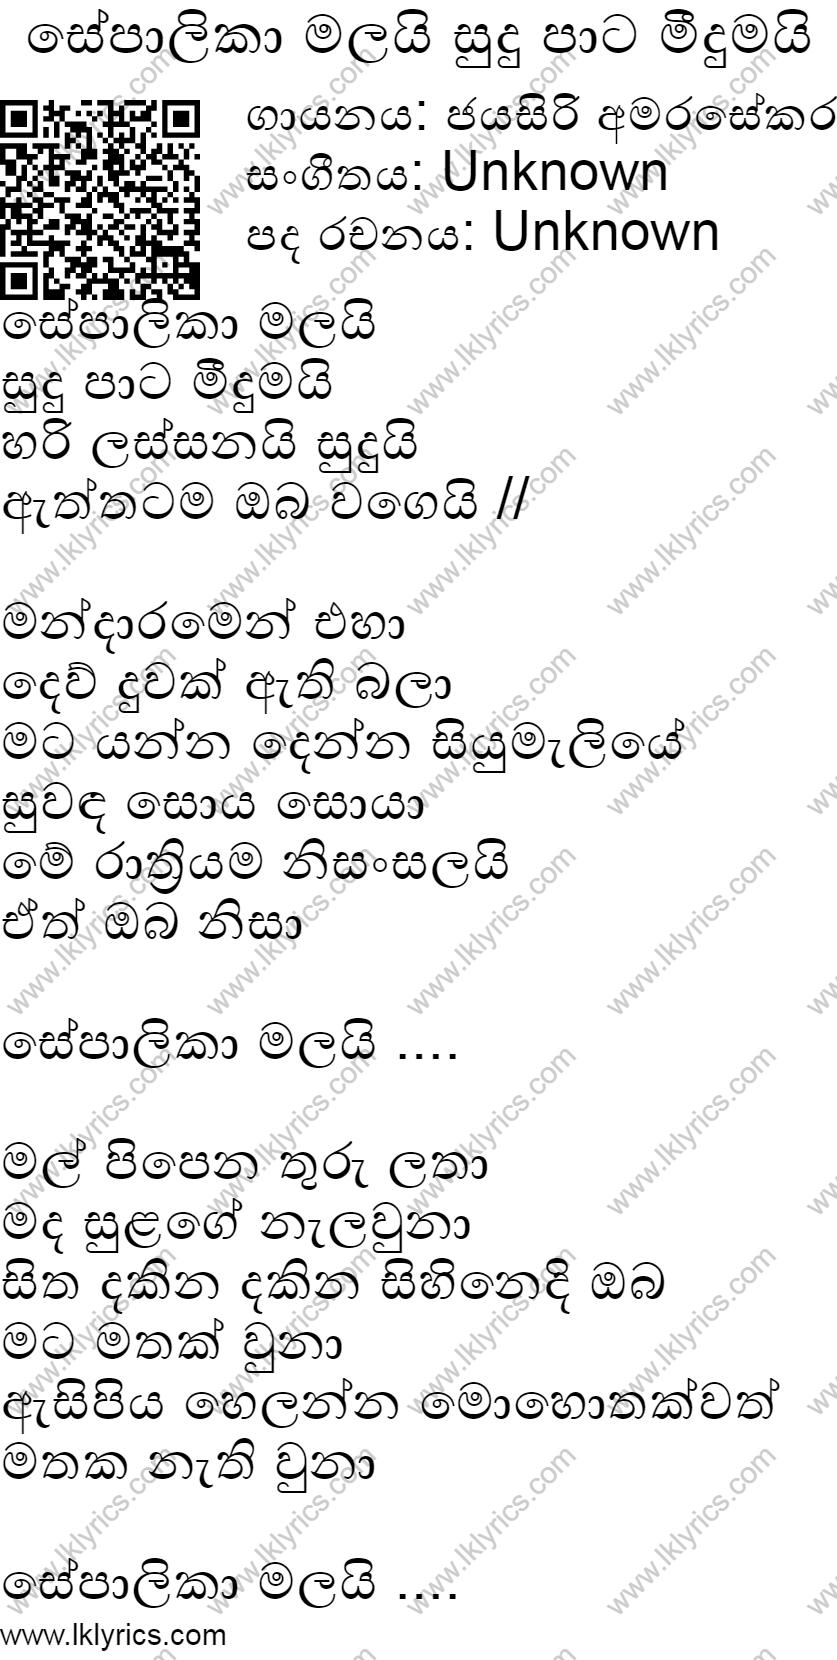 sepalika malai song mp3 free download